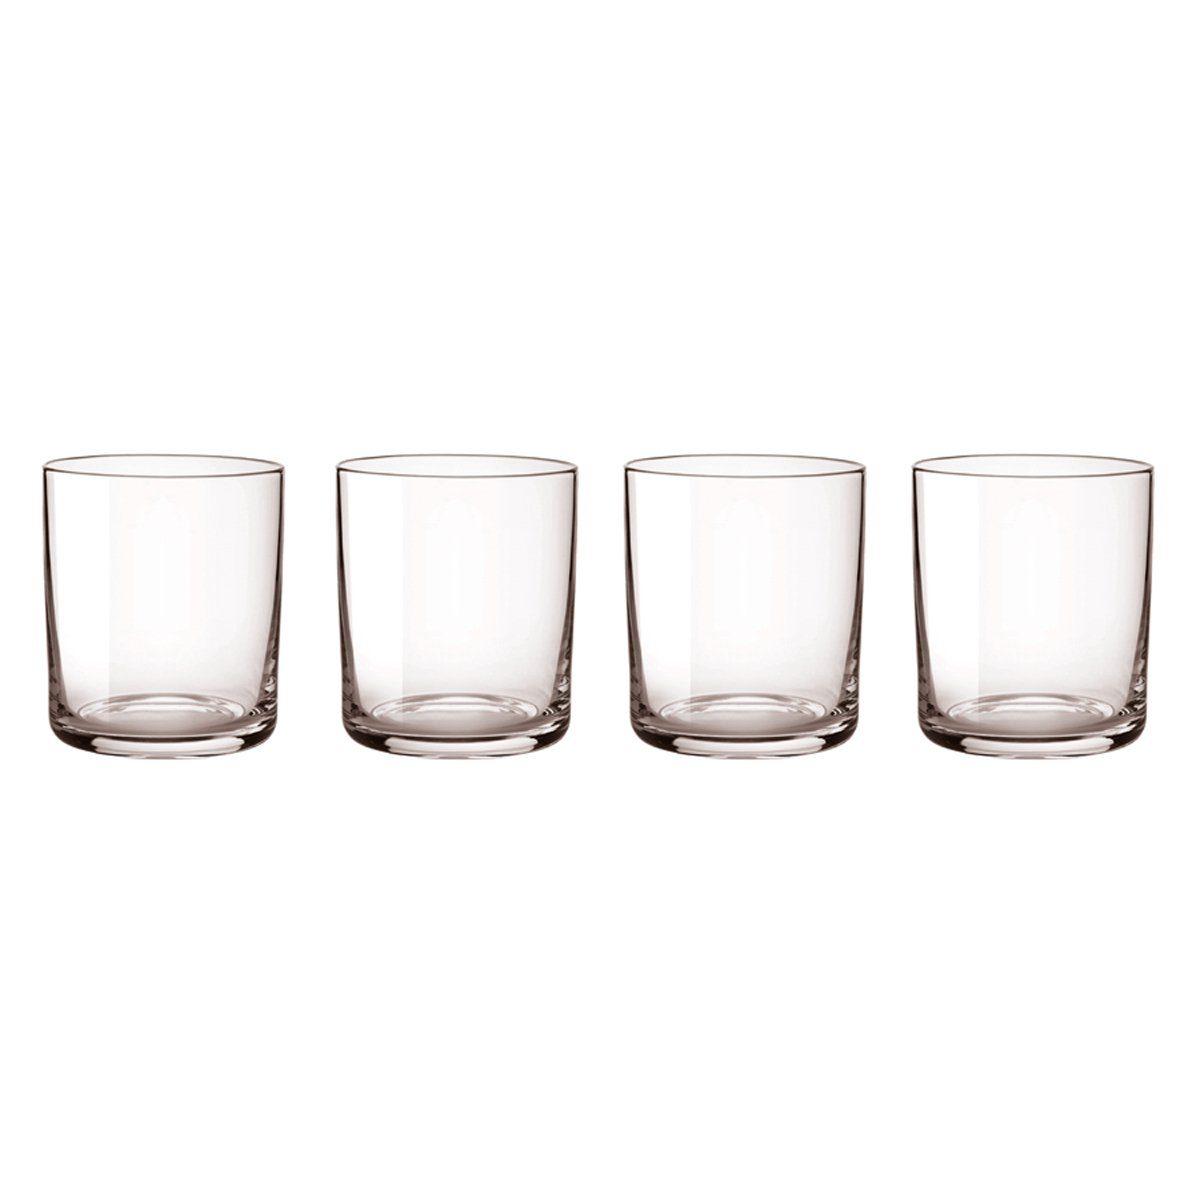 Stelton Stelton Gläser SIMPLY grau - 4-er Set 0.3 l